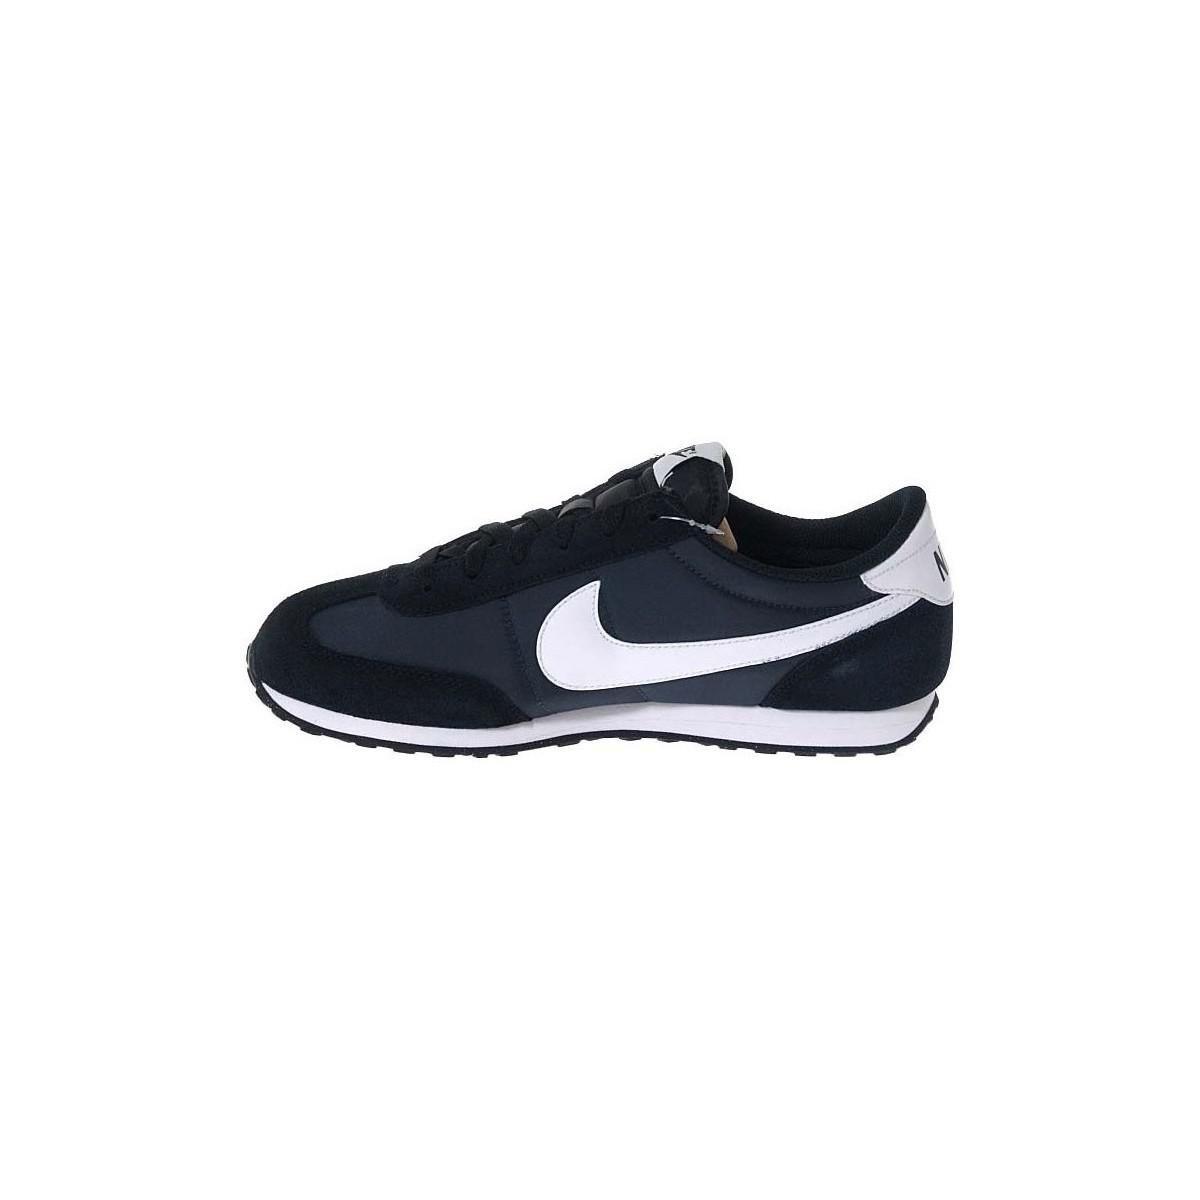 Énfasis Comienzo Prueba  Nike Mach Runner 303992 Men's Shoes (trainers) In Black for Men - Lyst